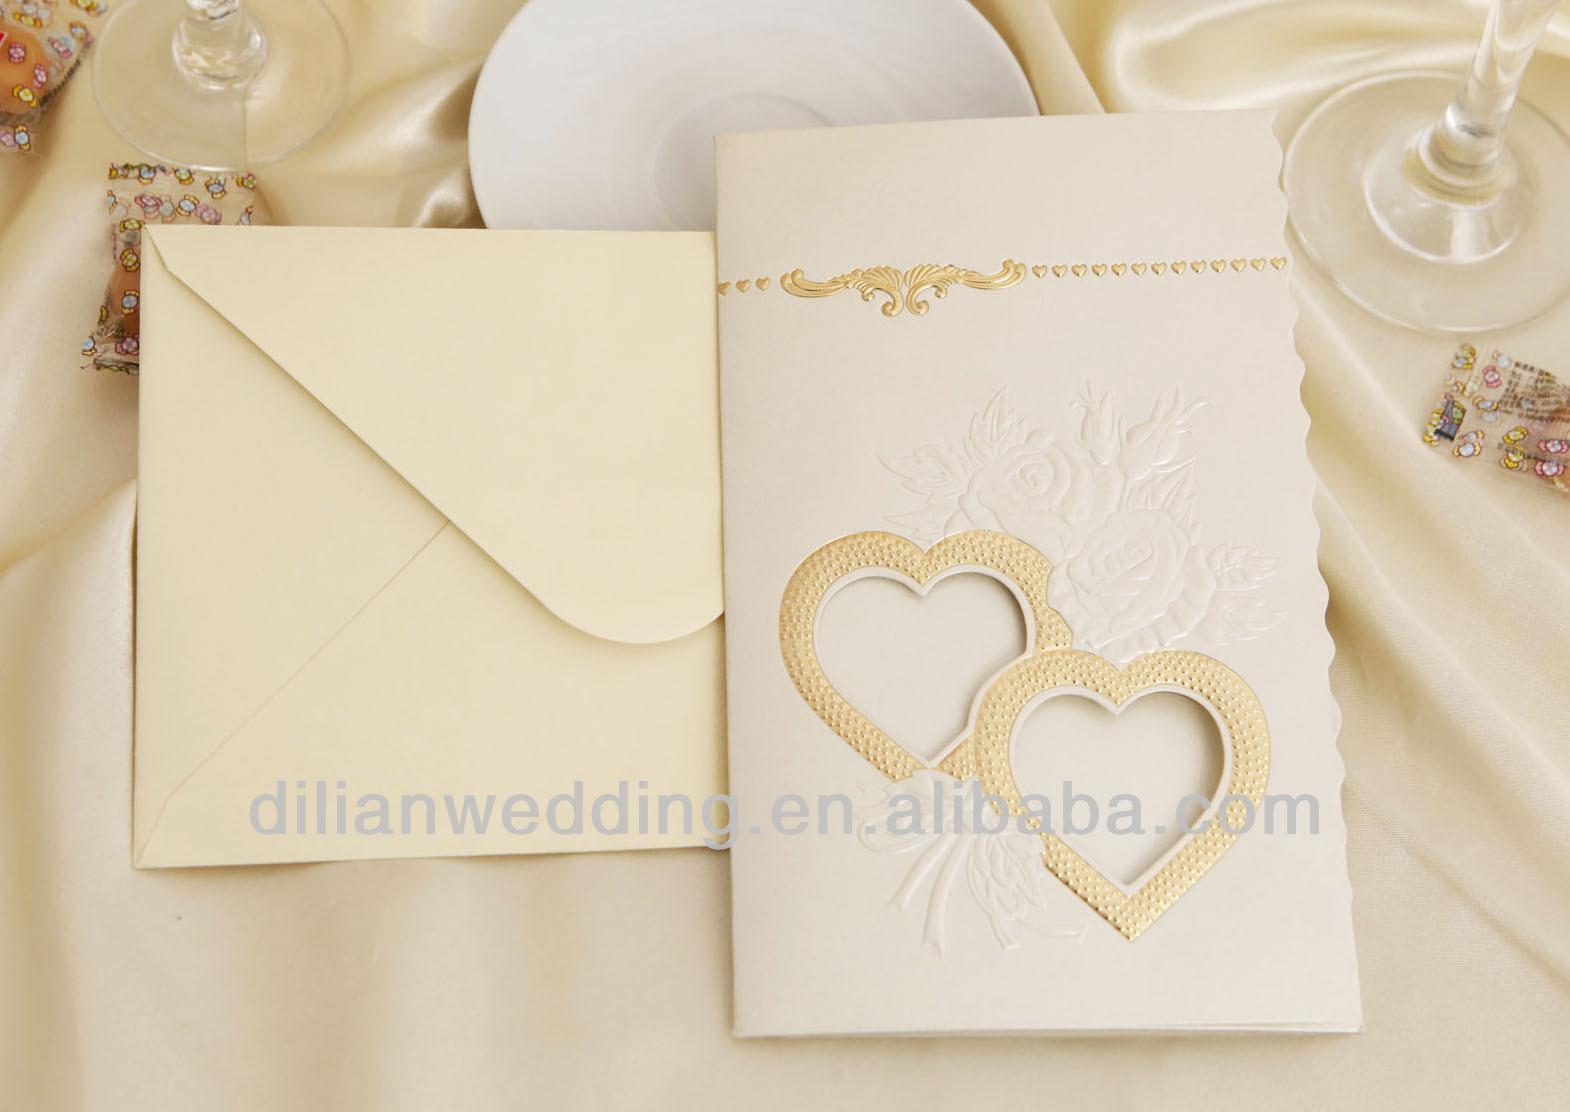 Christian Wedding Invitation Wording 84 Good Wedding invitations kerala style